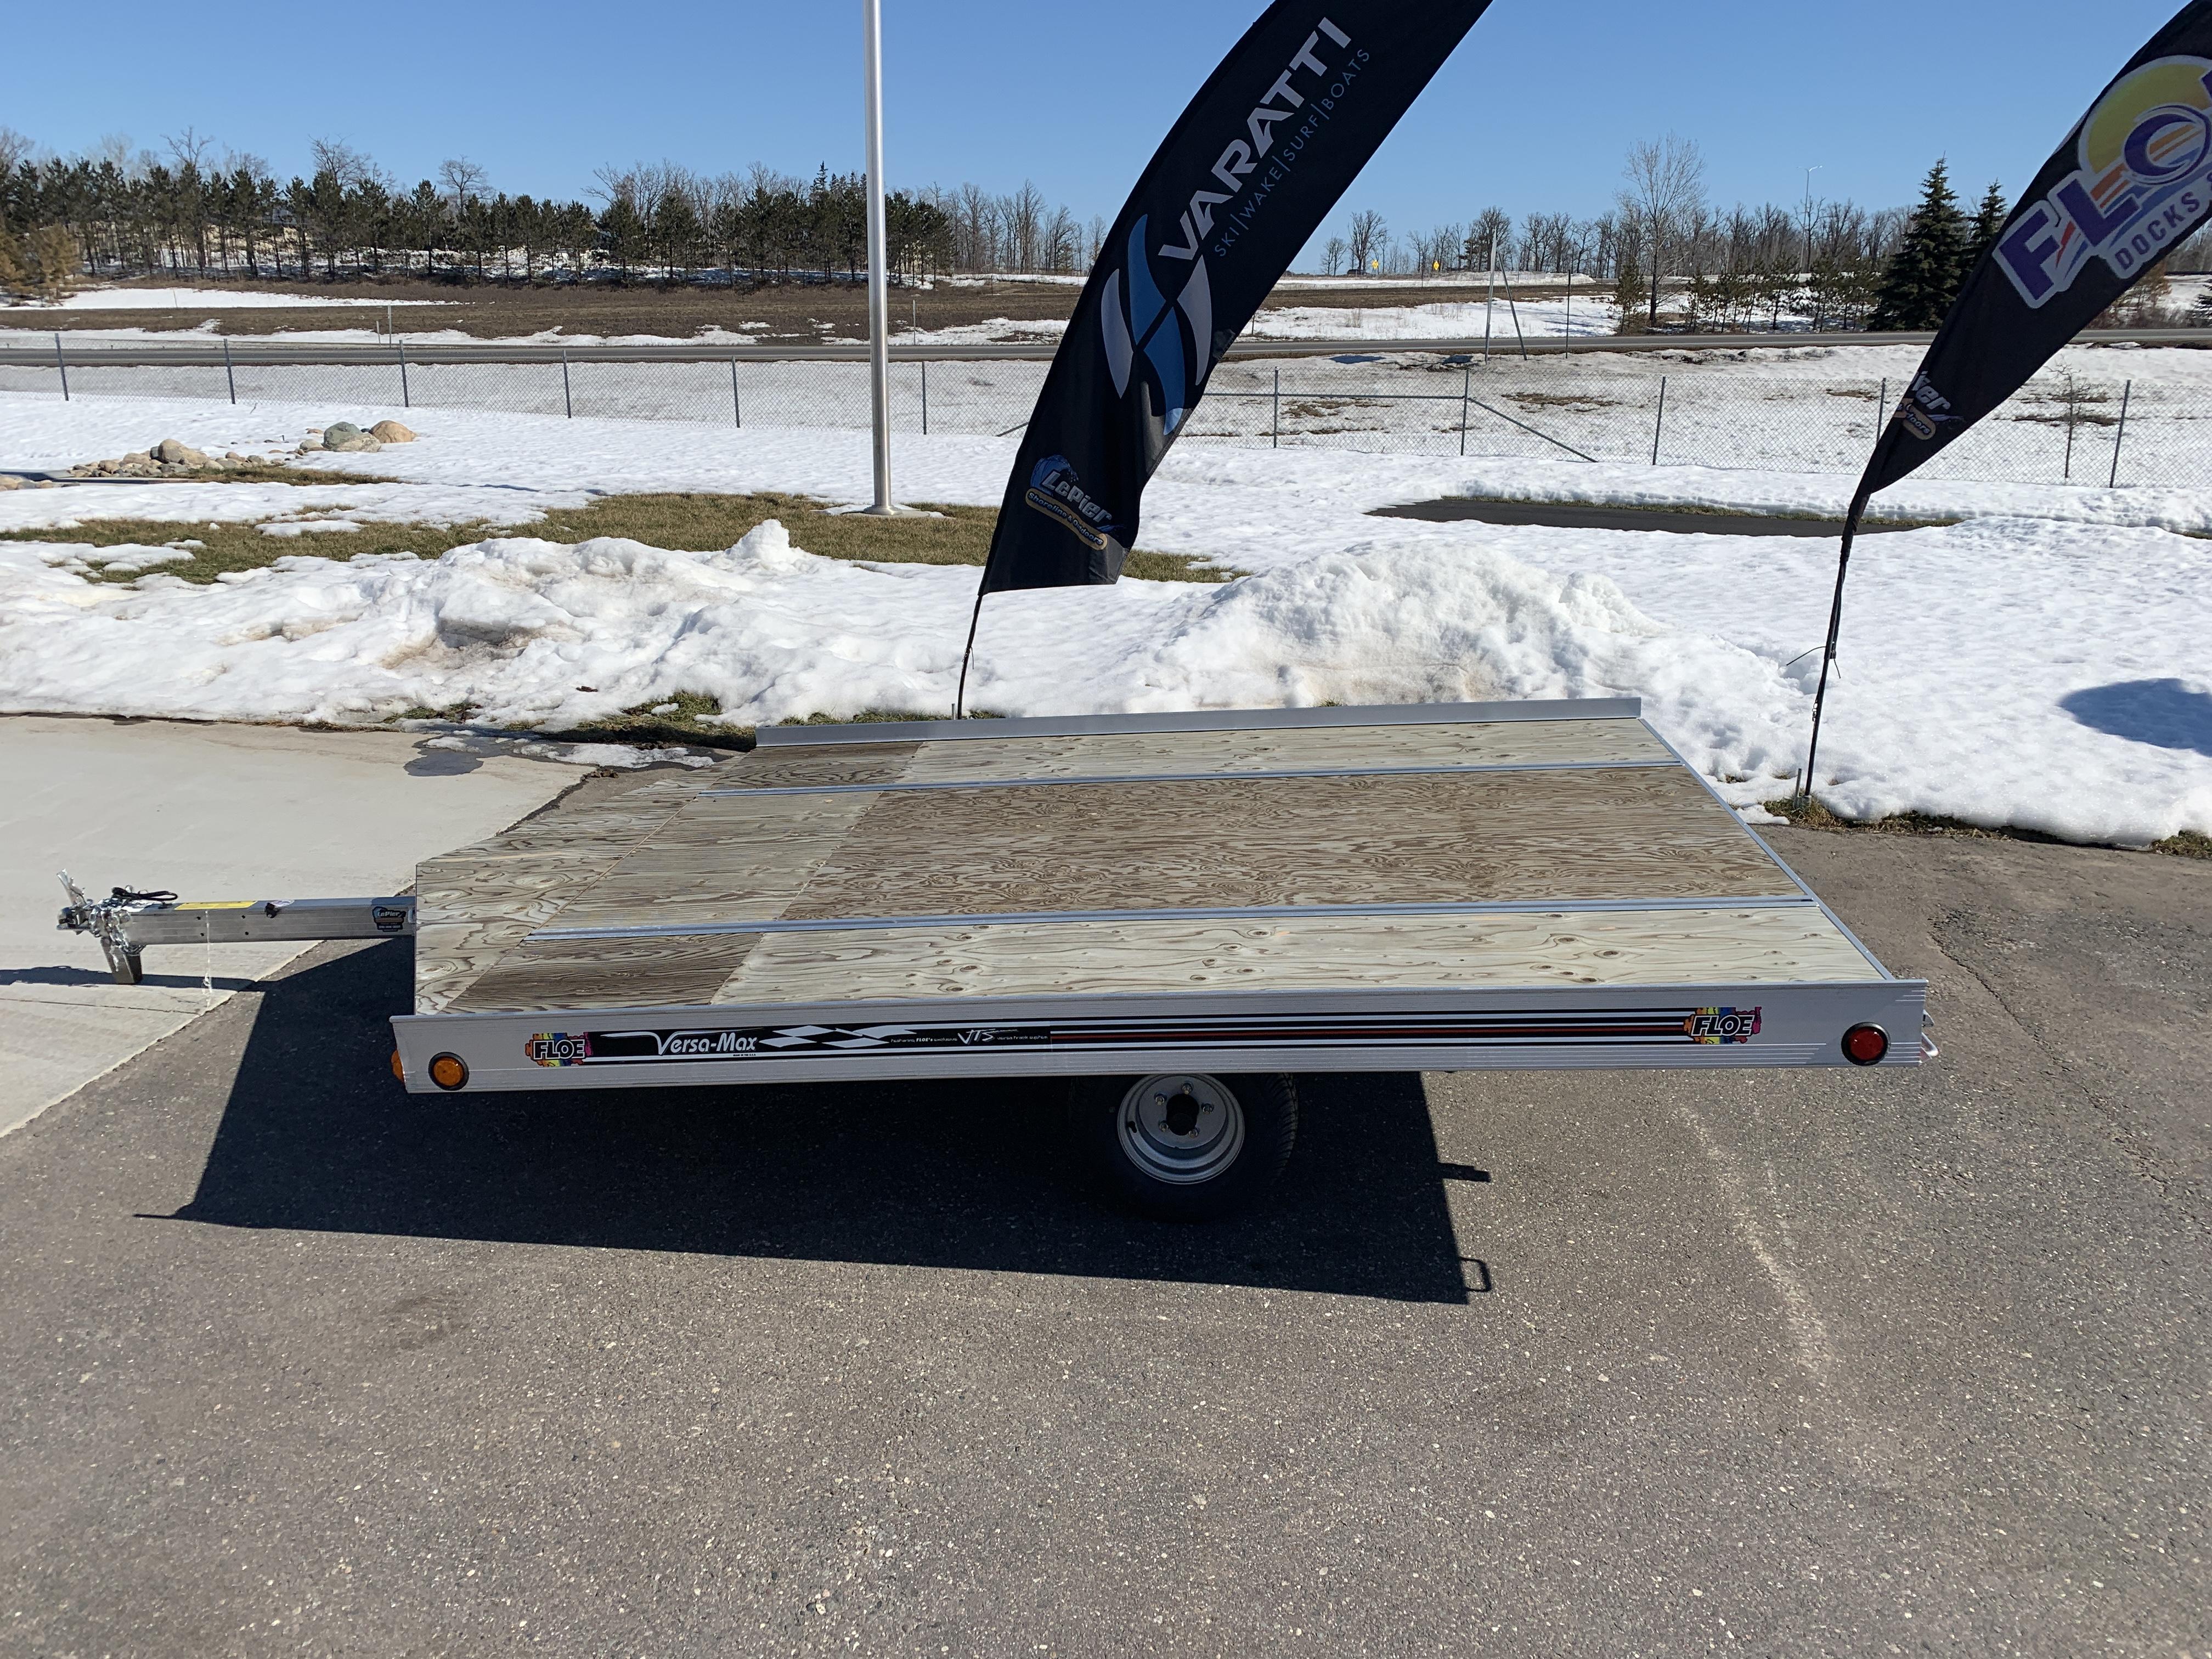 Floe Versa-Max Snowmobile Trailer 10' Ramp | Stock # 0139 on trailer hitch harness, trailer generator, trailer brakes, trailer plugs, trailer fuses, trailer mounting brackets,